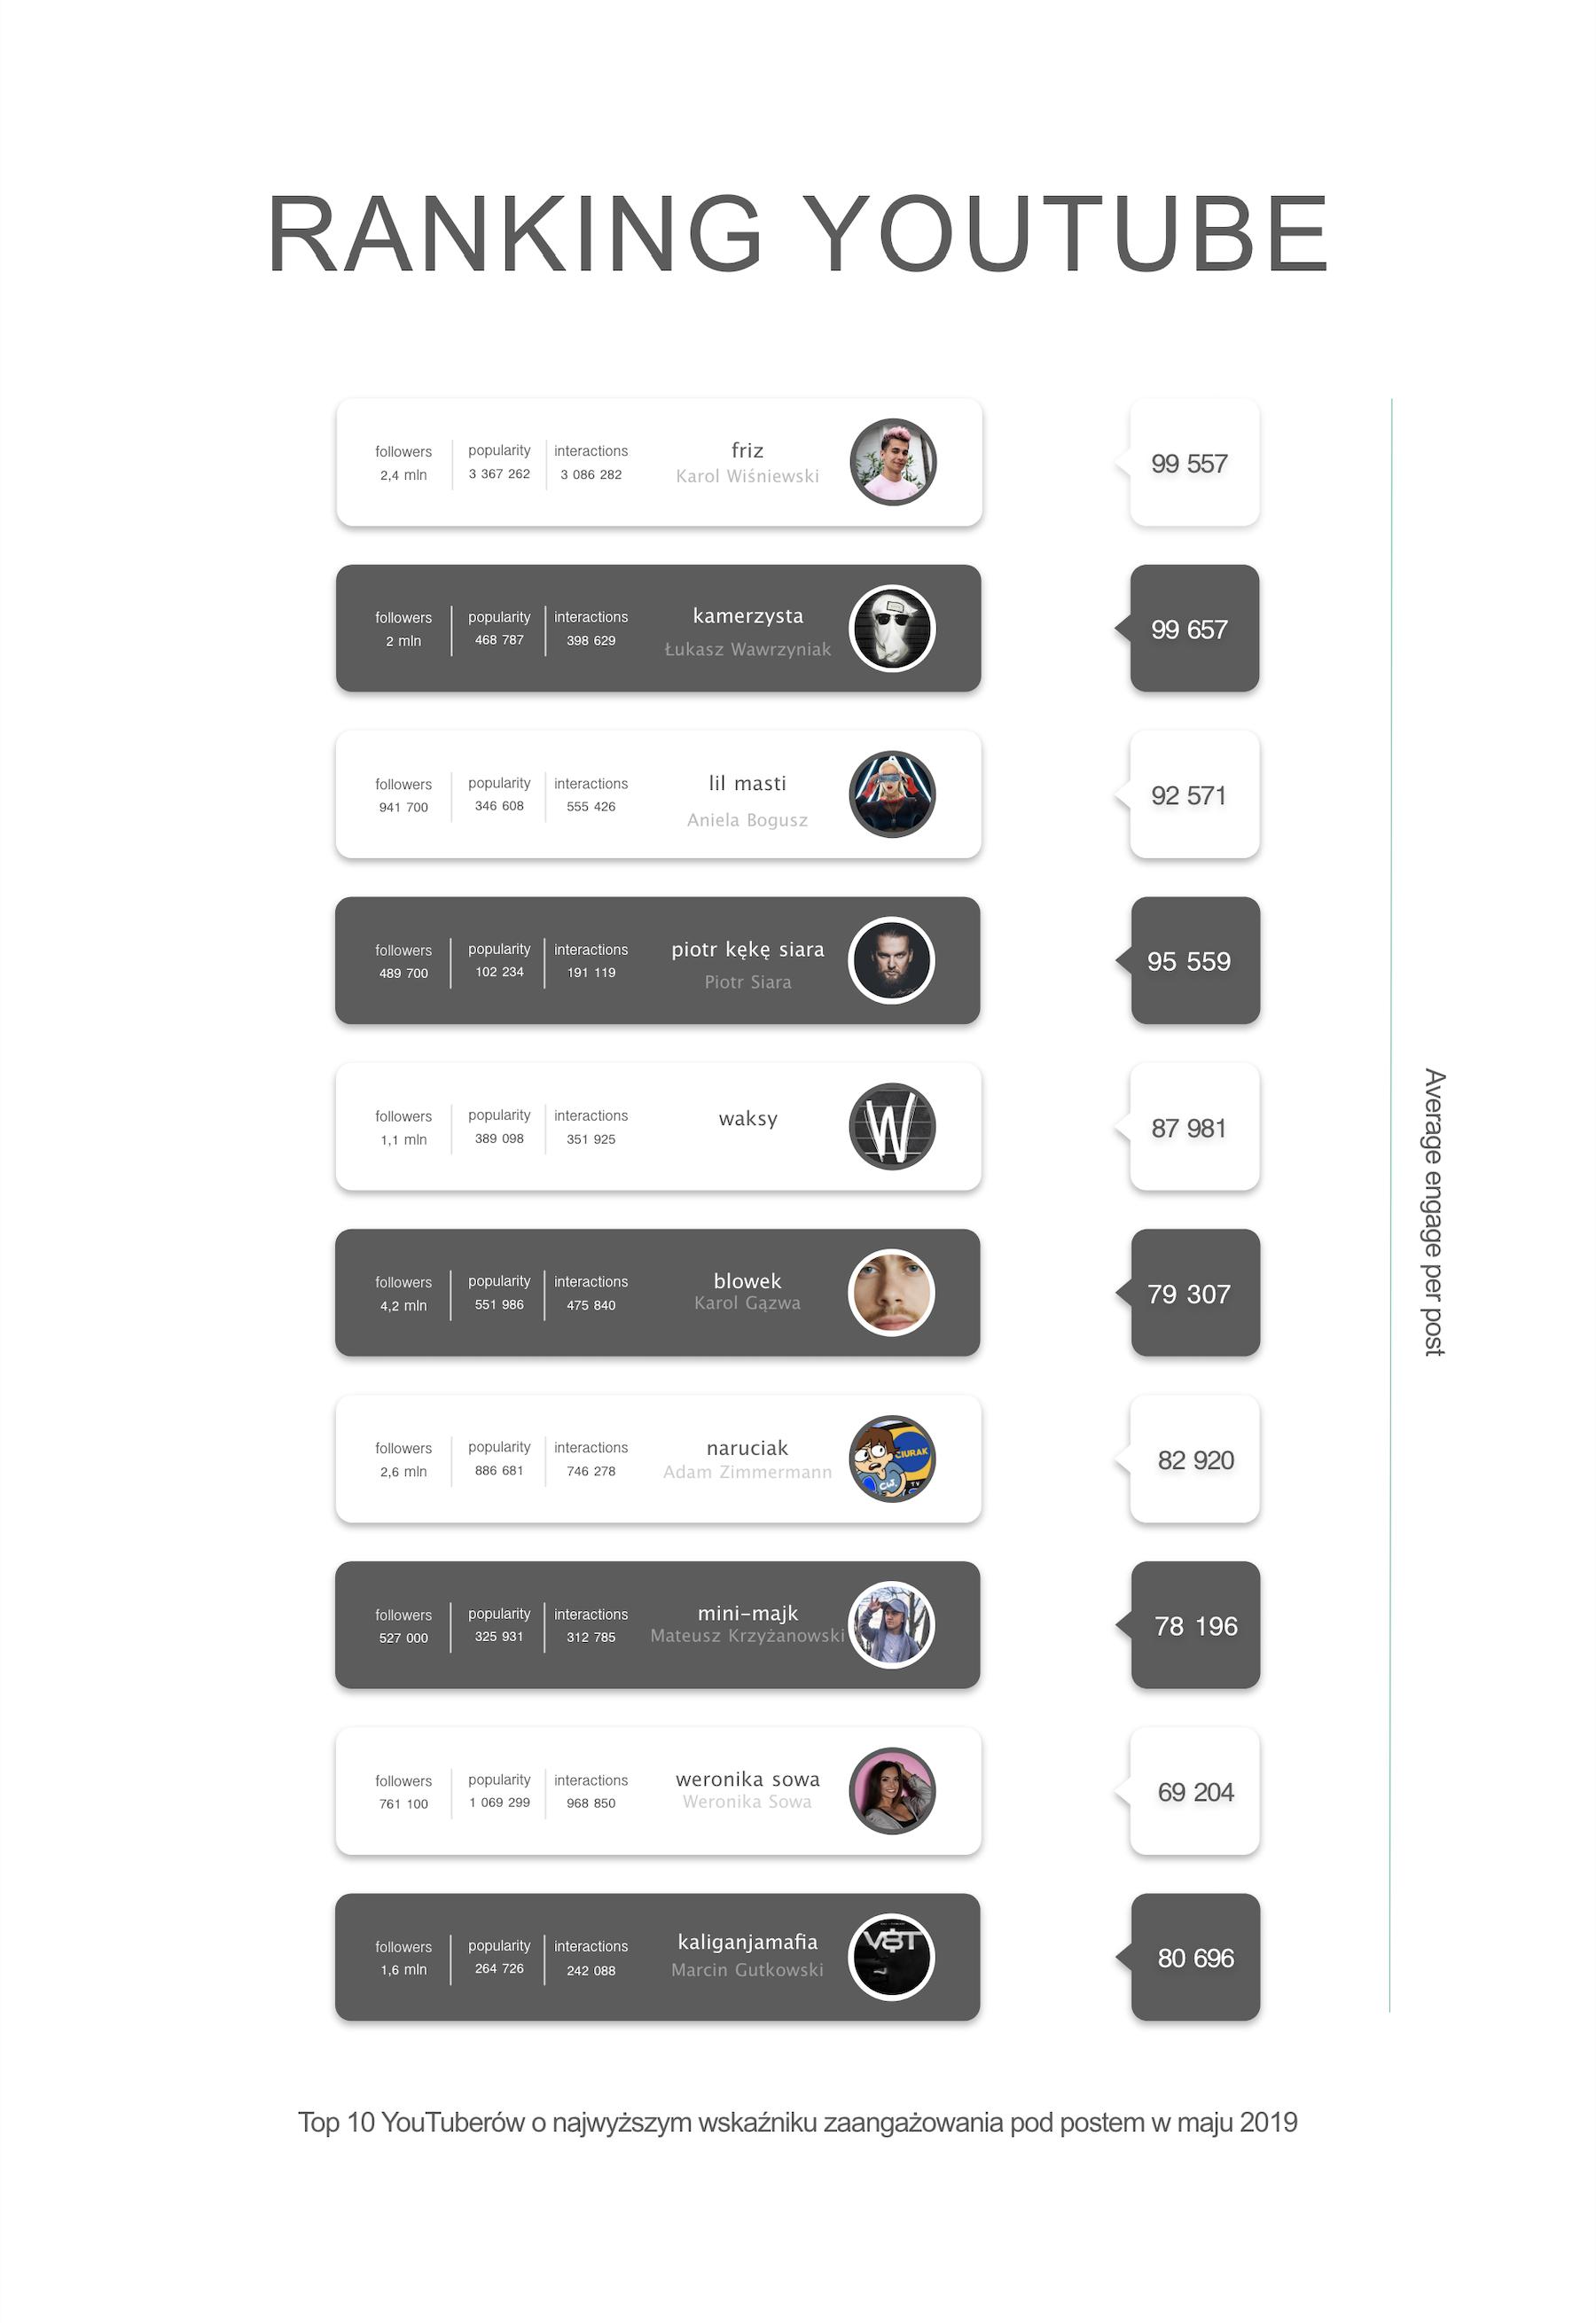 Ranking YouTube Maj 2019 engageg per post